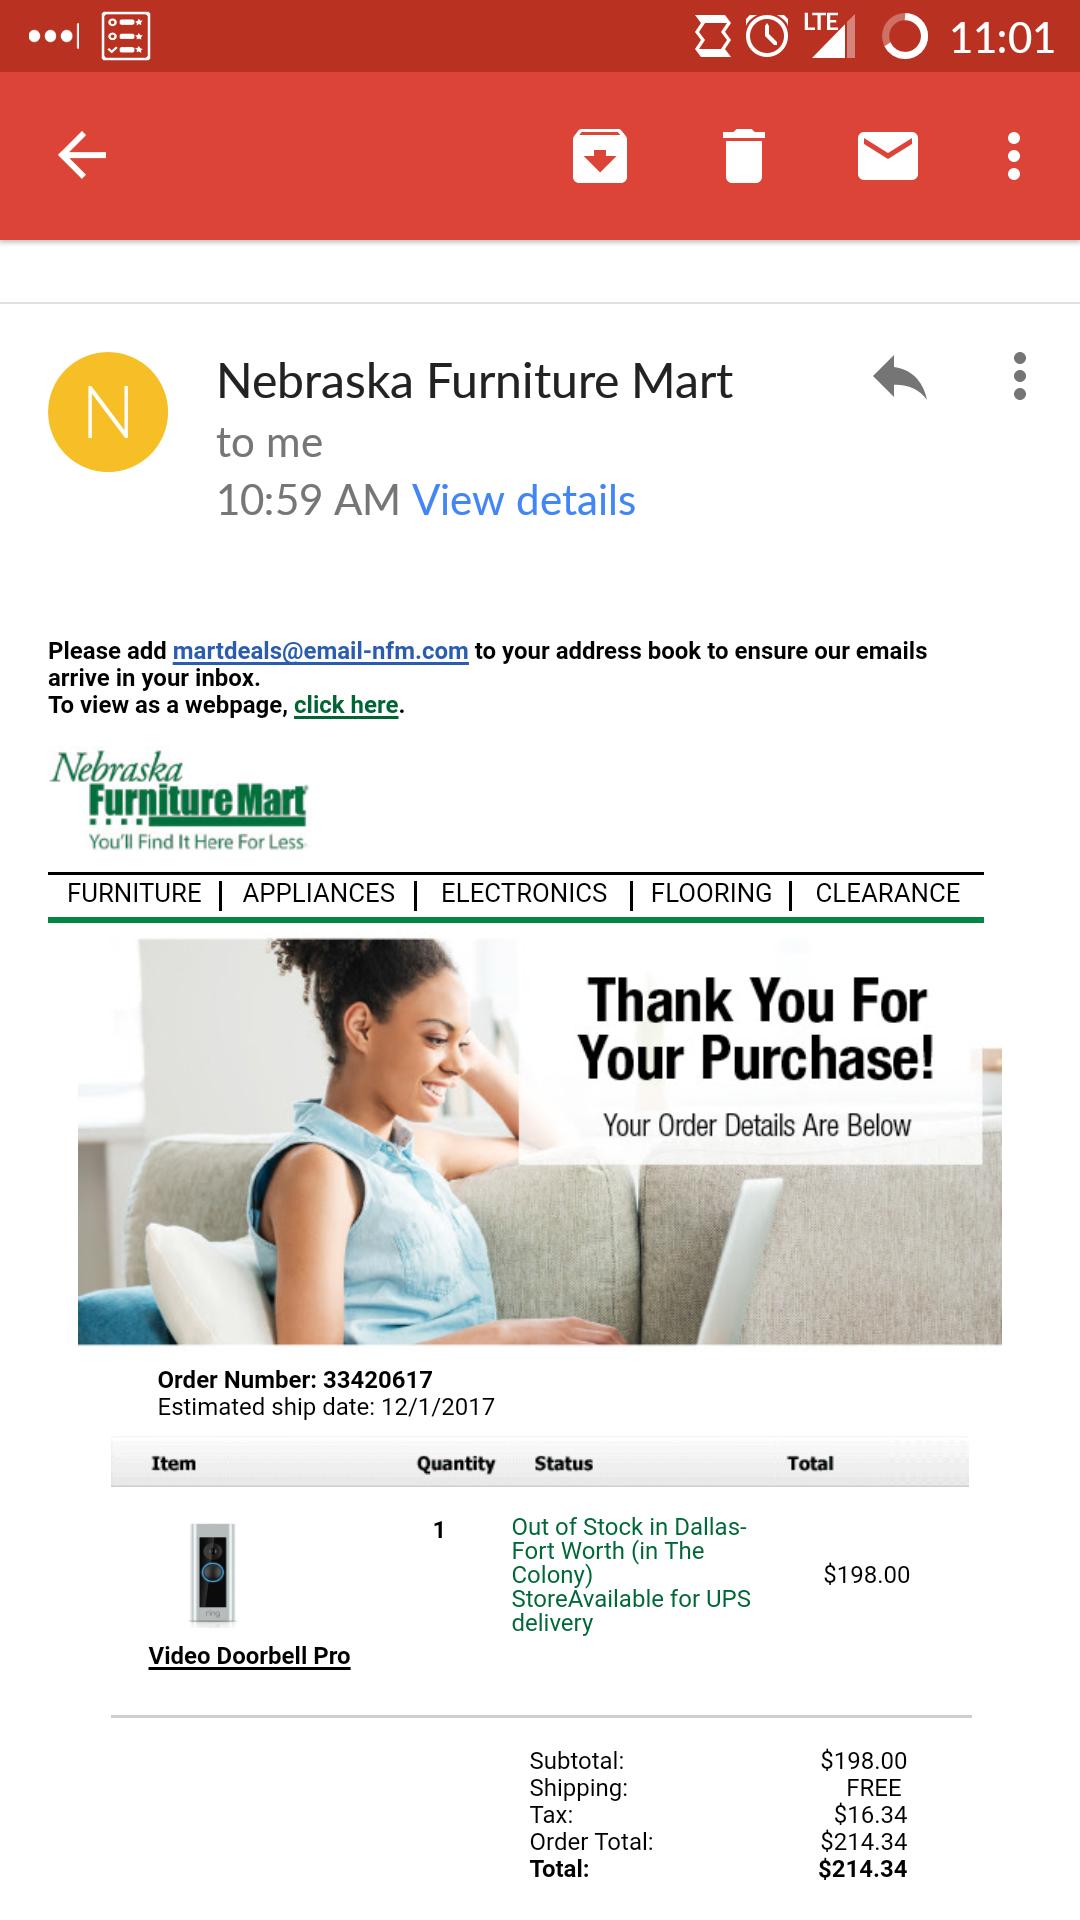 Ring doorbell pro for $198 @ NFM.com mobile site